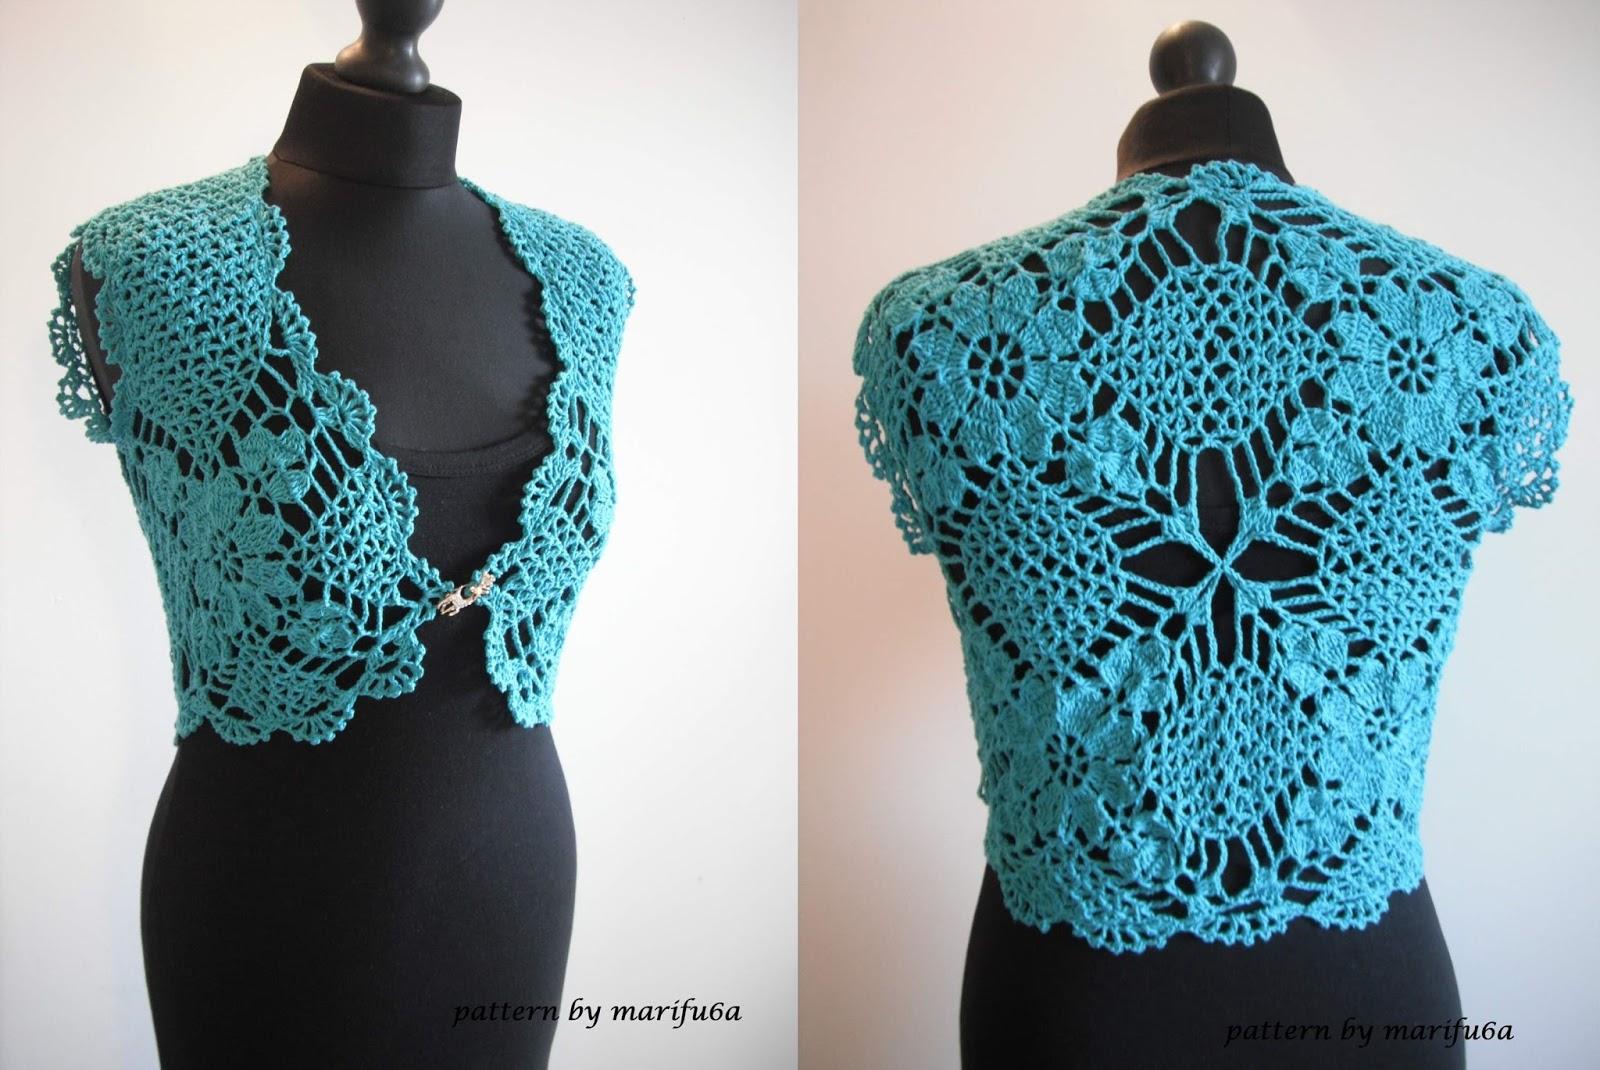 How To Crochet Mint Bolero Shrug Chaleco Free Pattern And Video